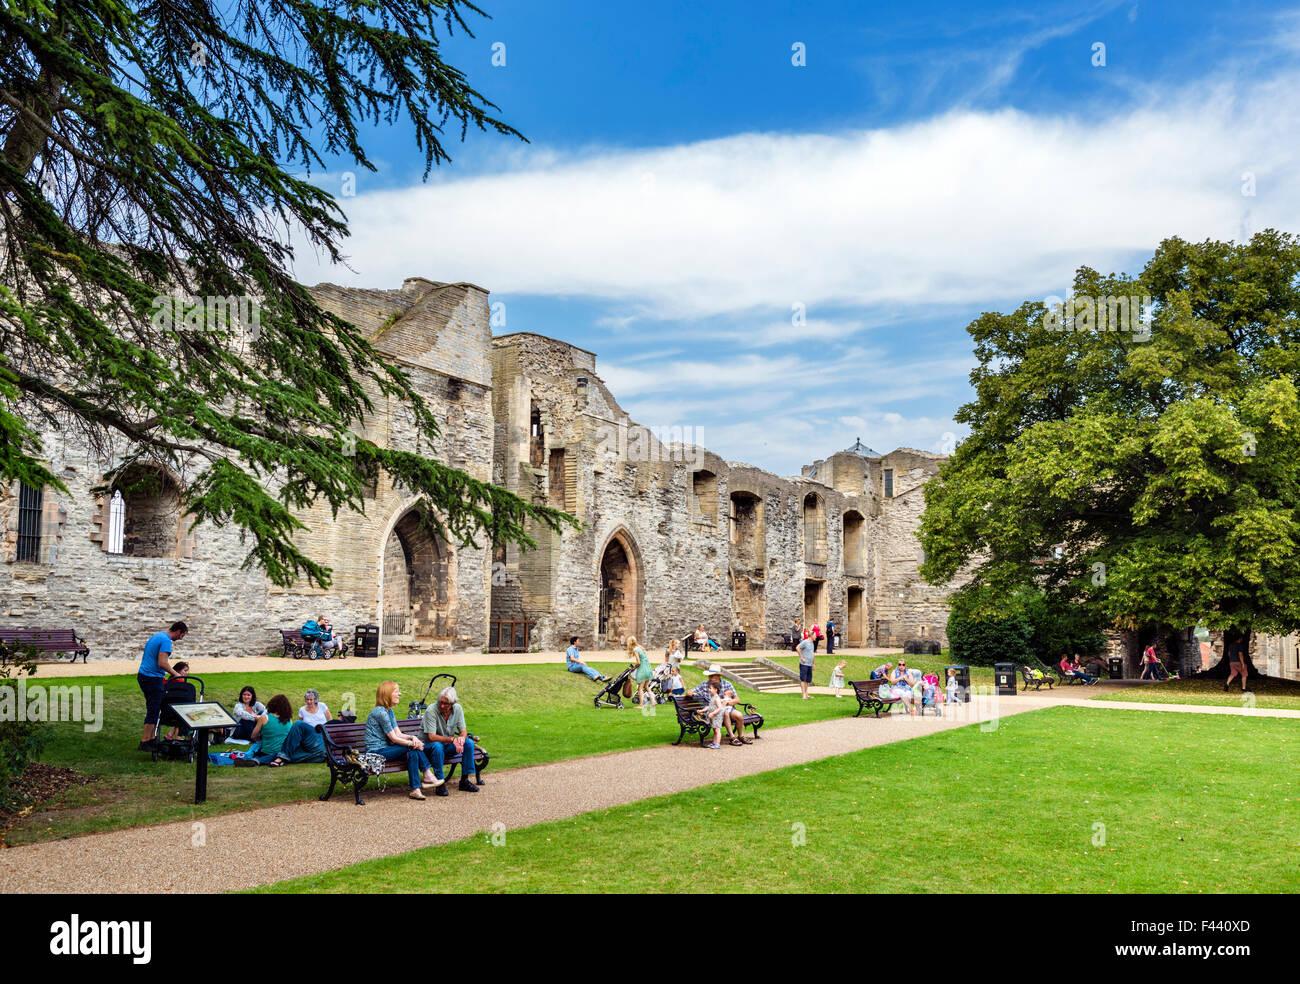 The ruins of Newark Castle, Newark-on-Trent, Nottinghamshire, England, UK - Stock Image